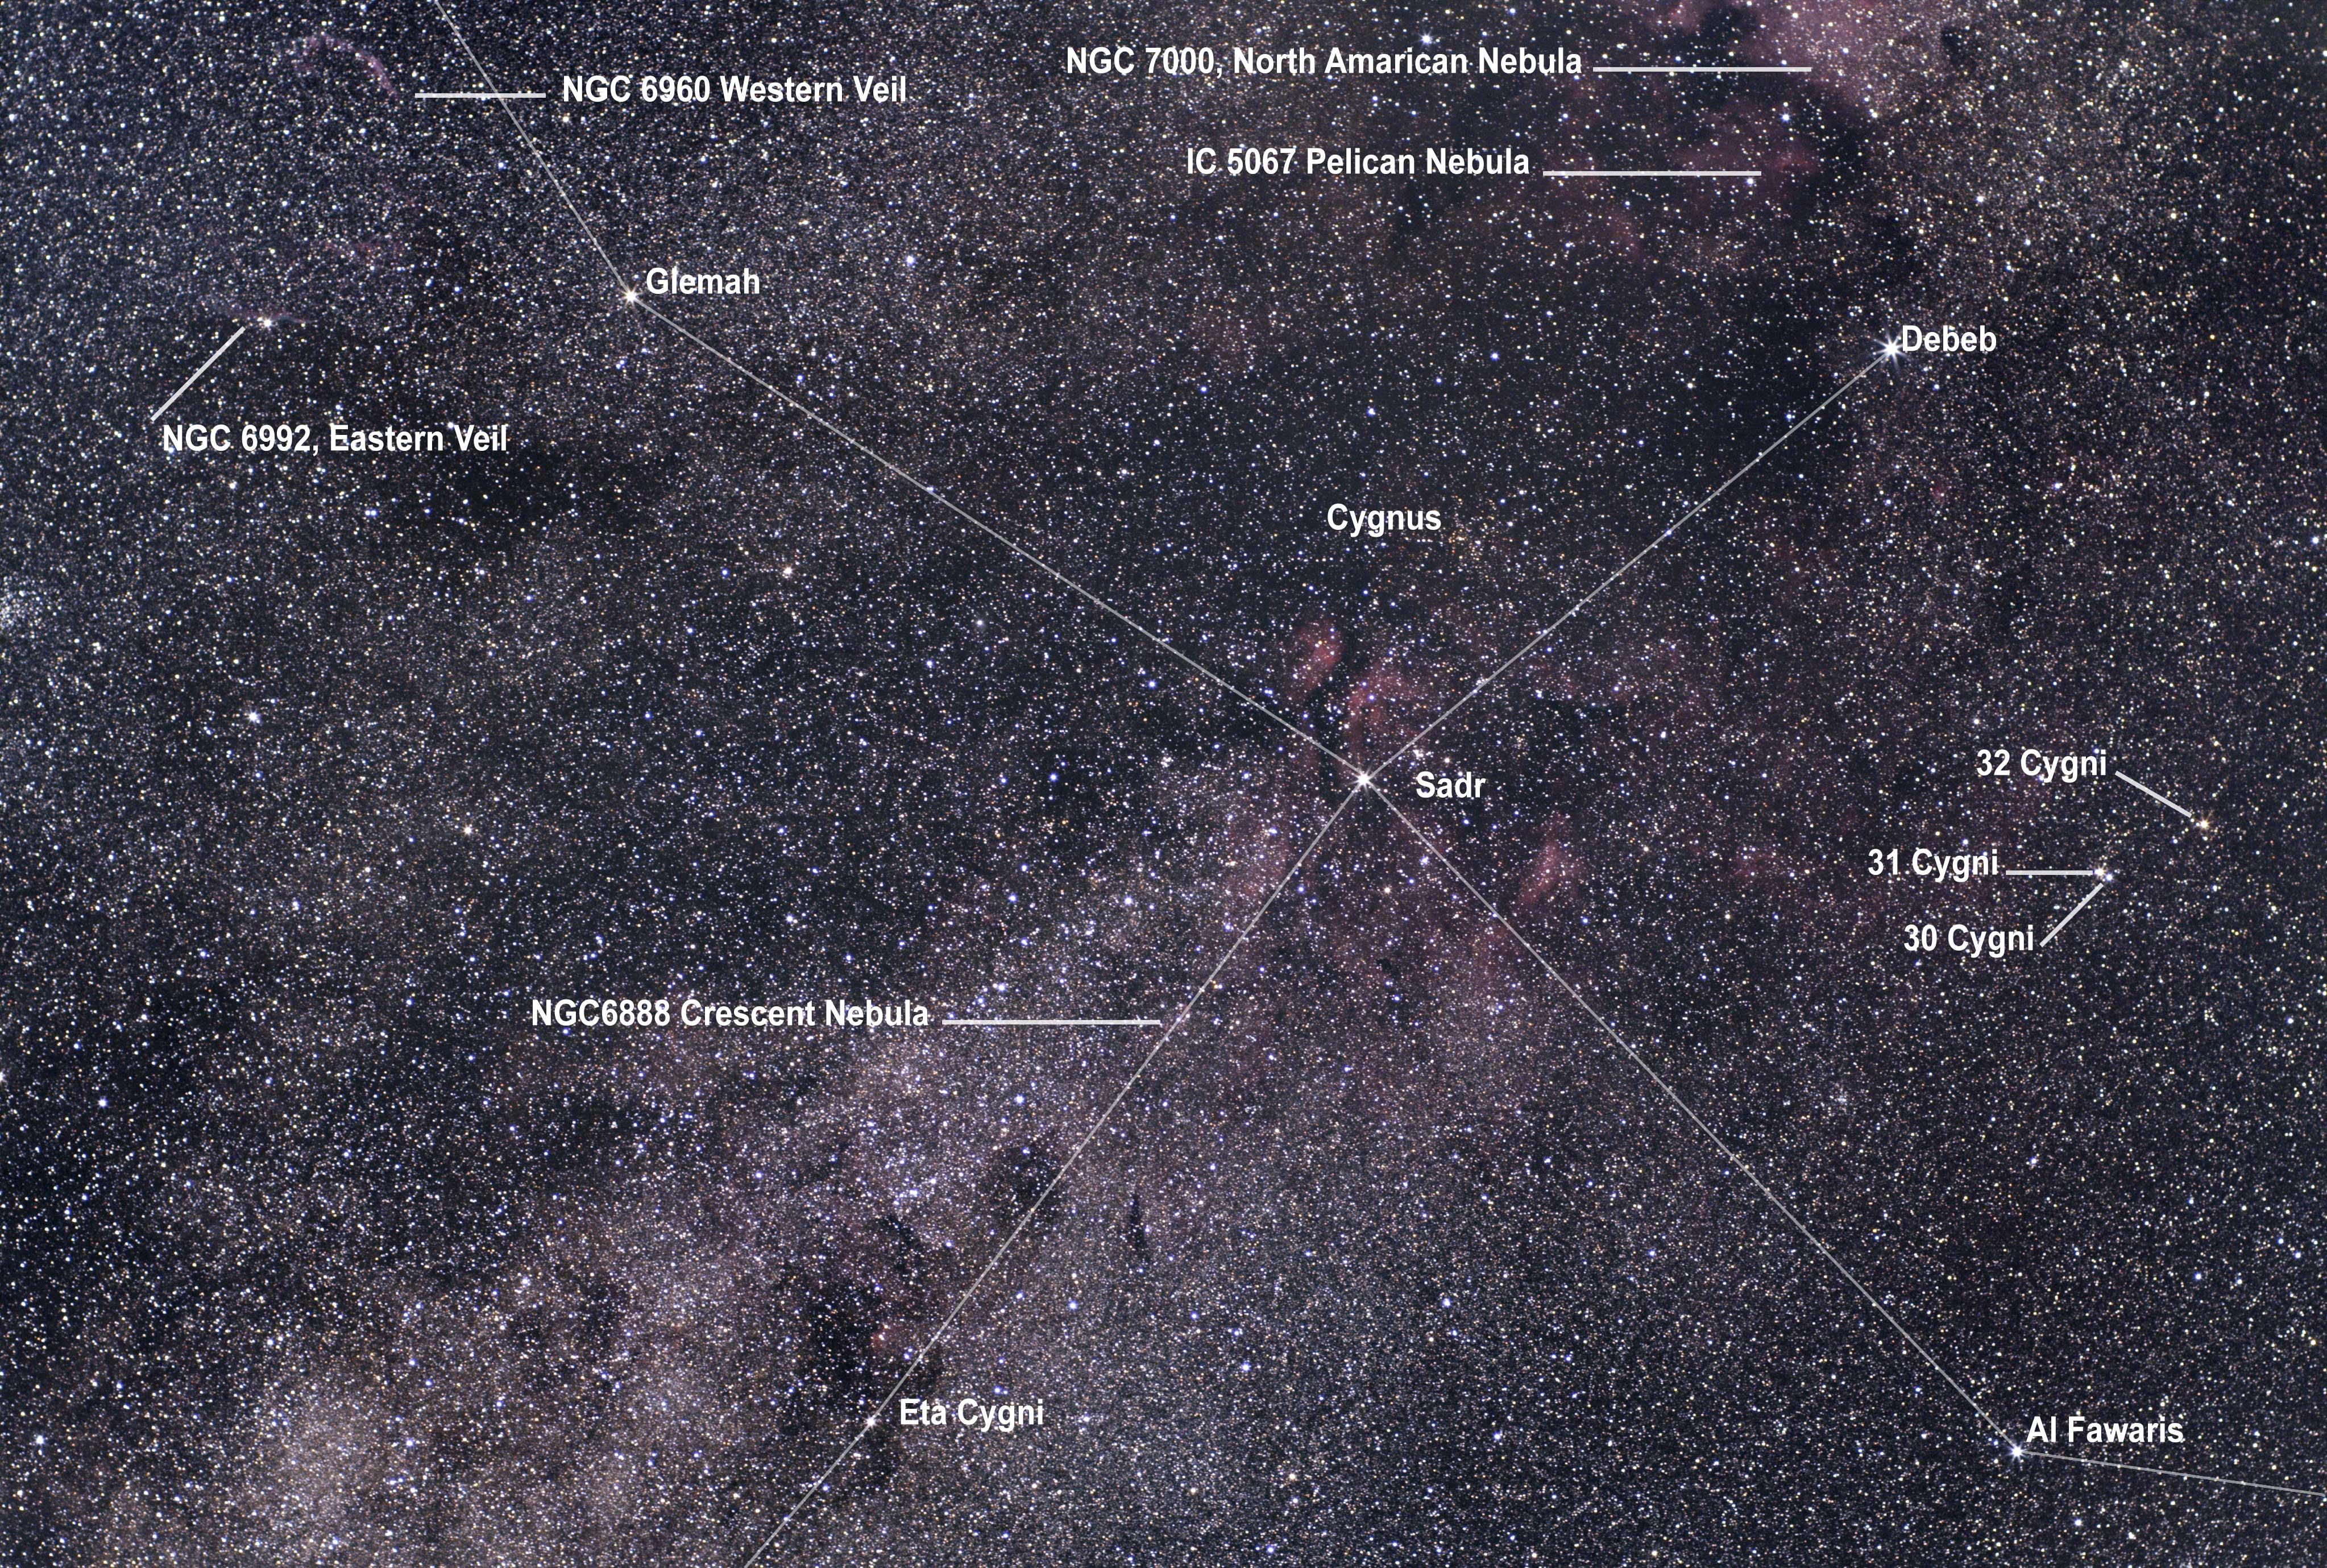 Cygnus wide field, Olympus 50mm lens & ASI294MC Pro